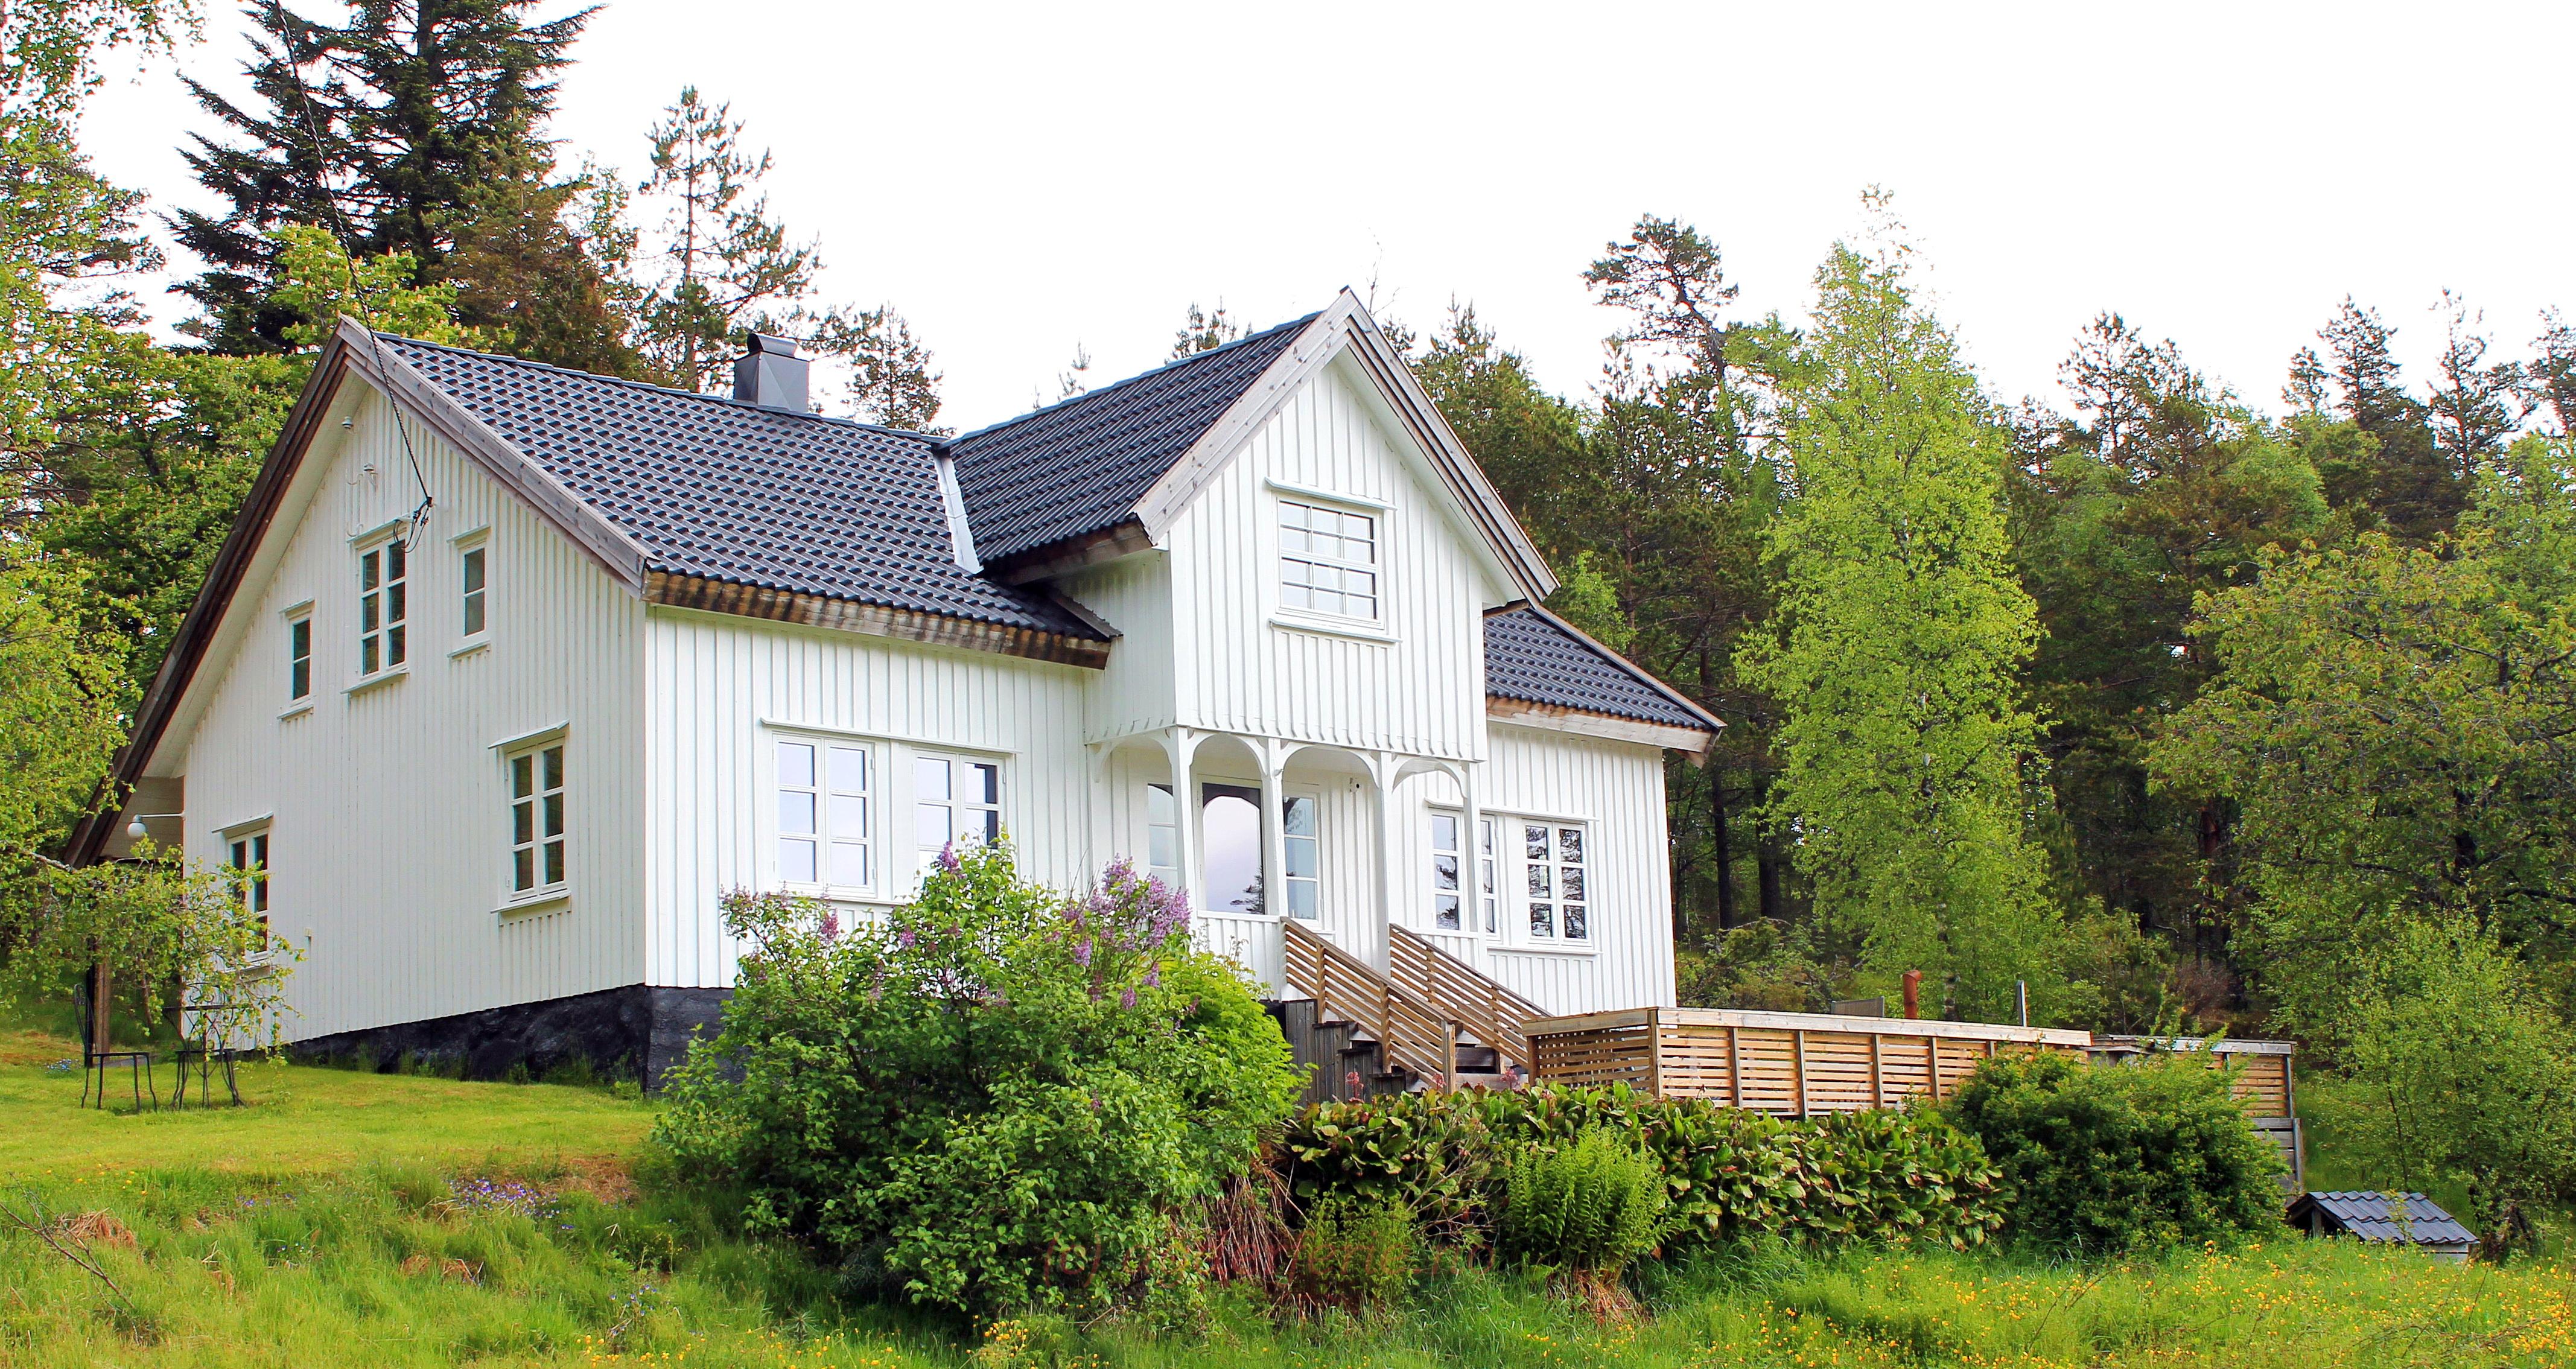 104 Hægeland, Vennesla